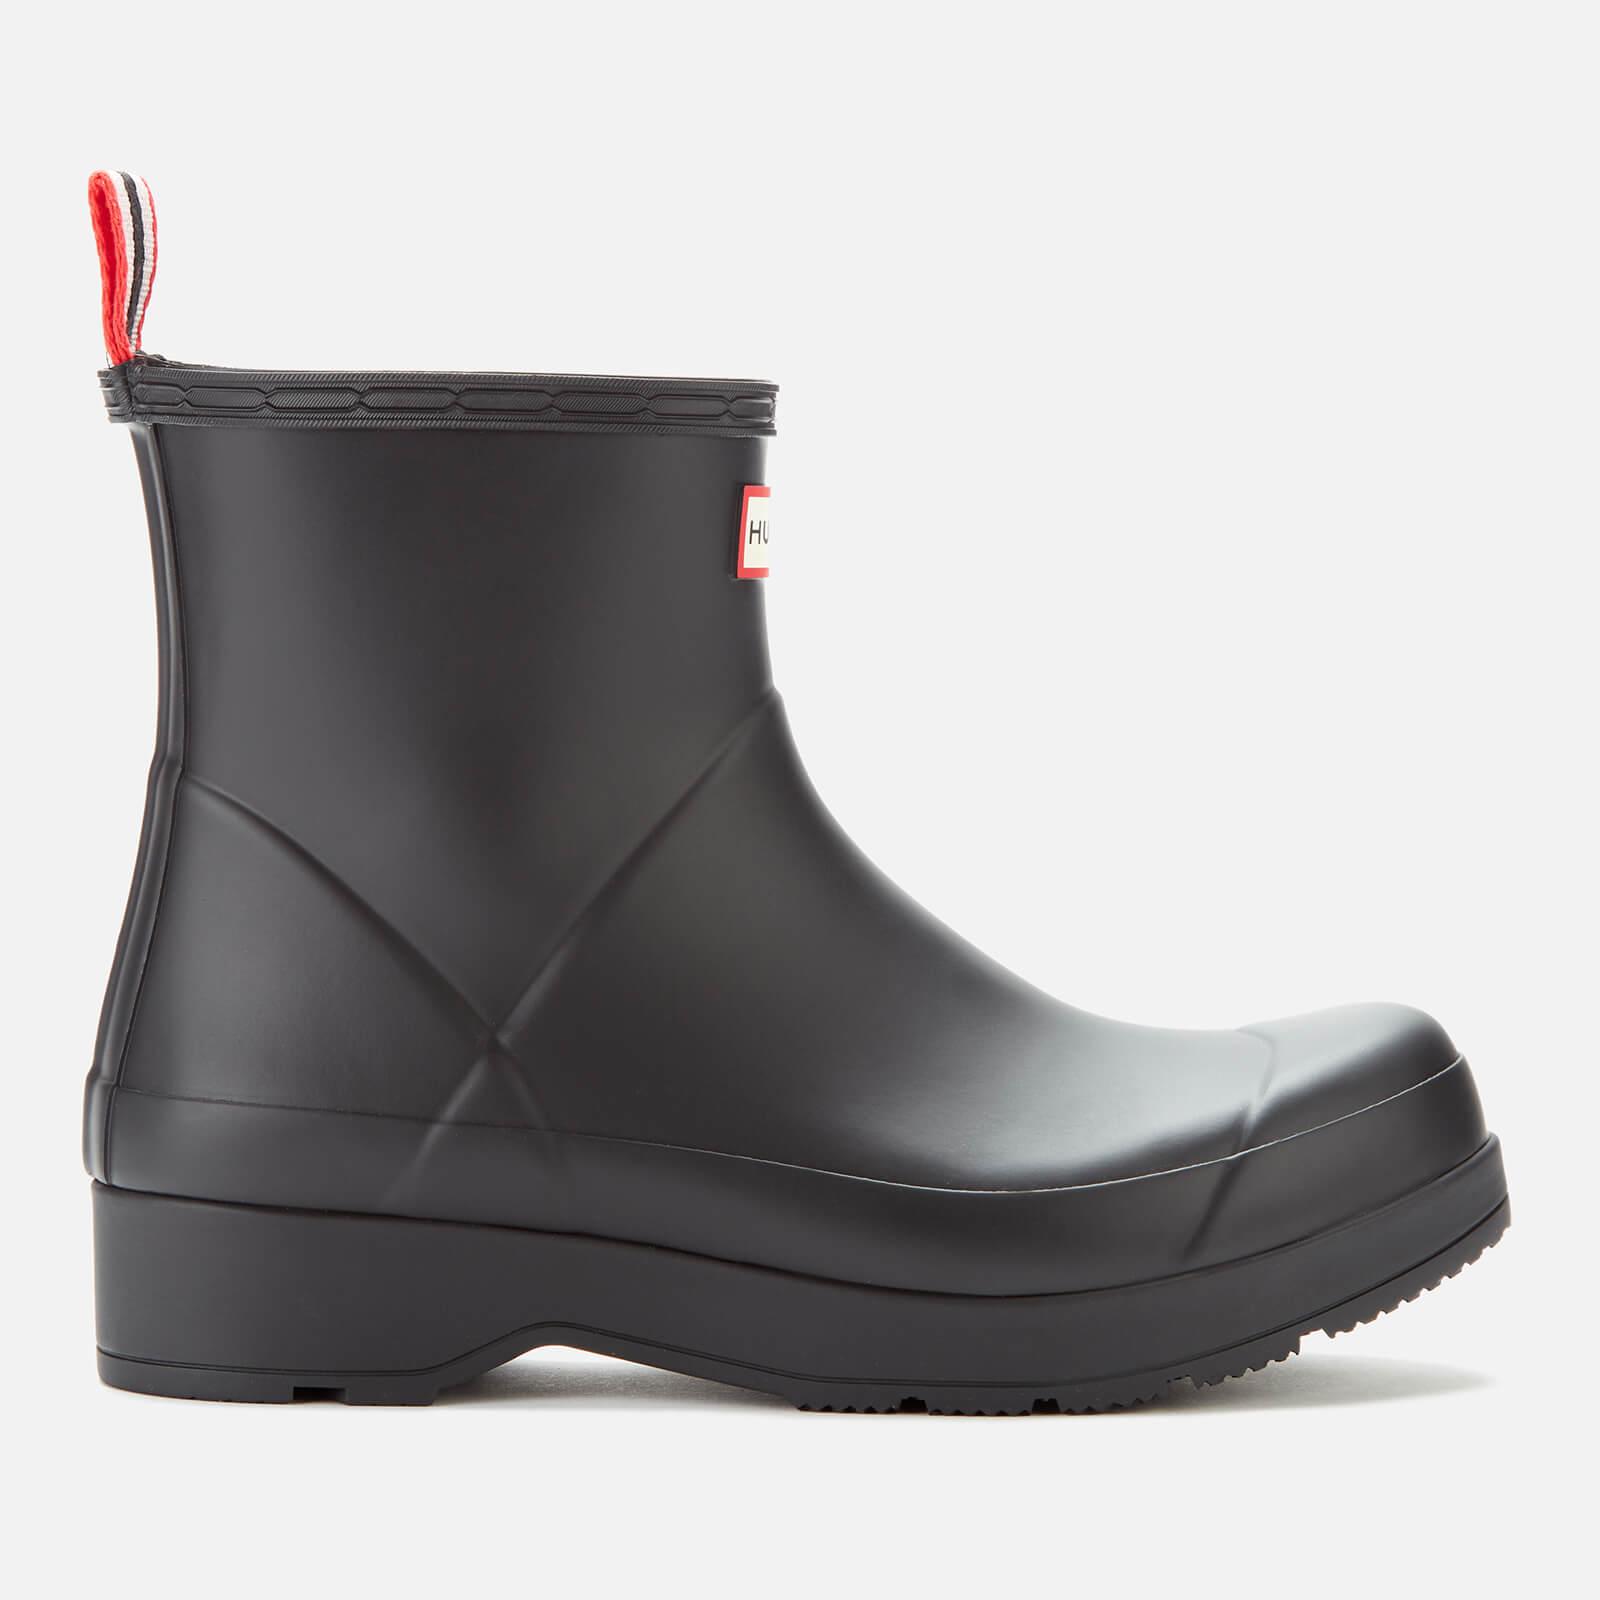 Hunter Men's Original Play Short Boots - Black - UK 8